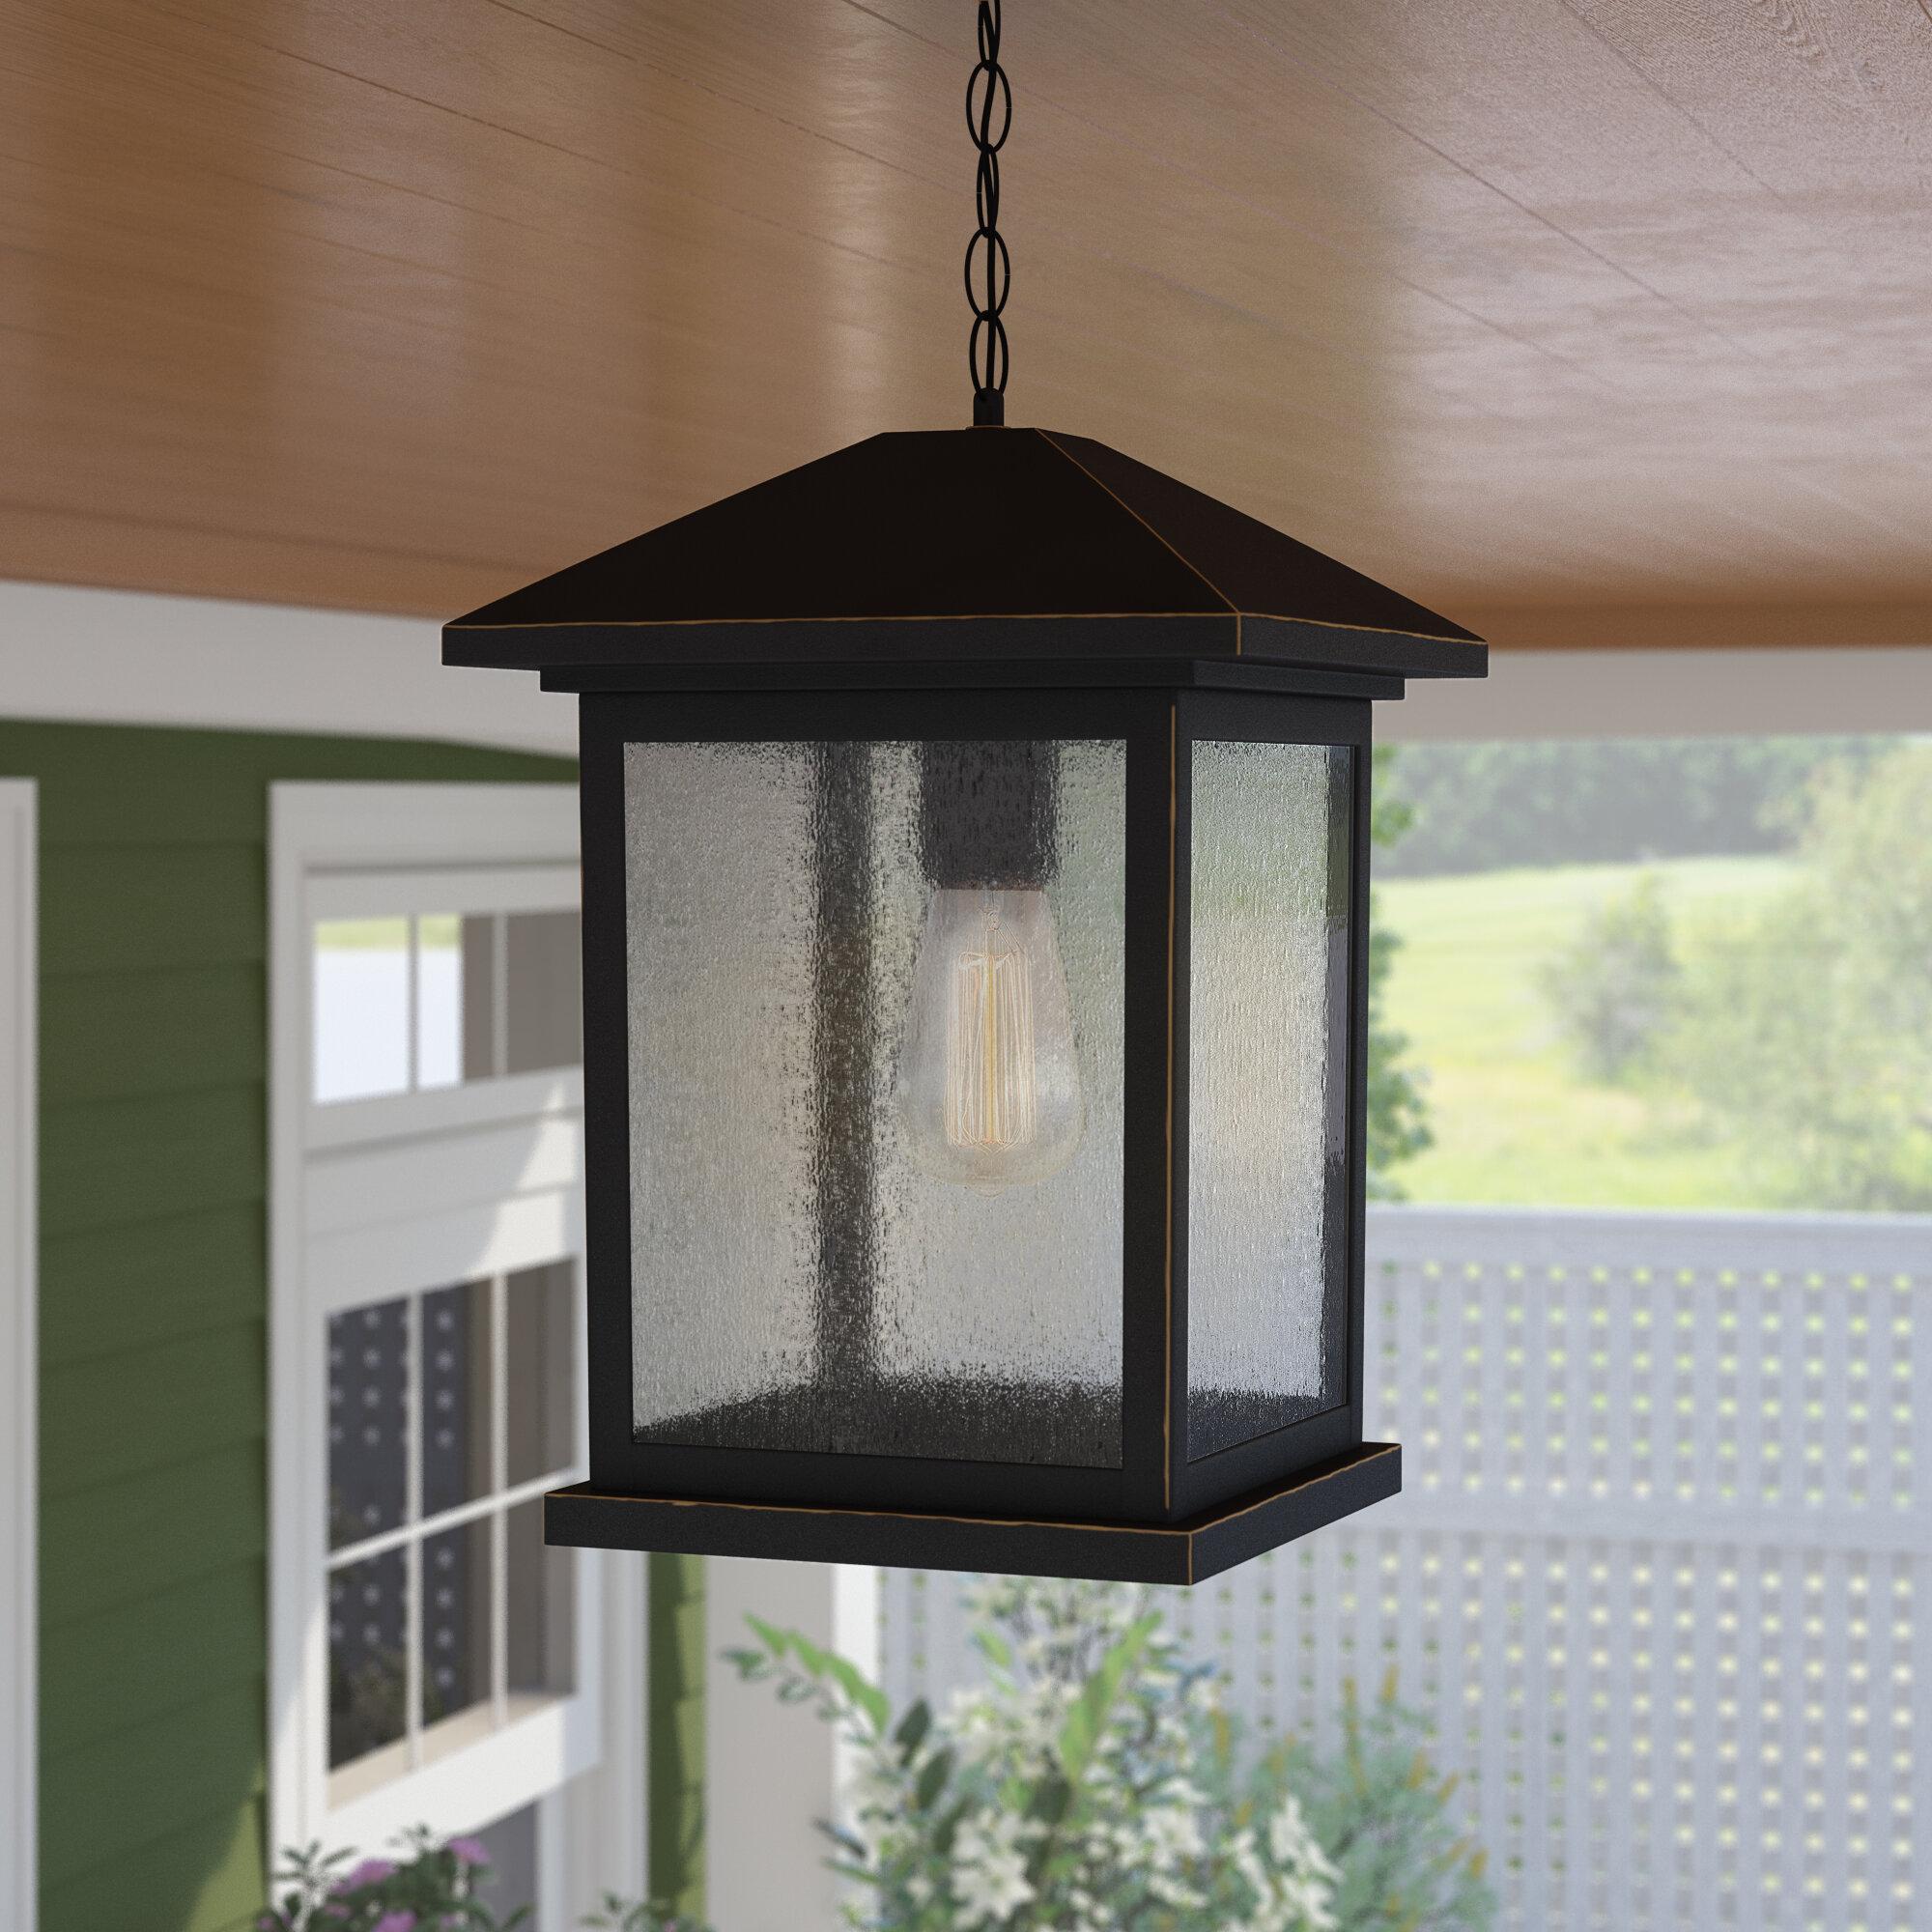 Sol 72 Outdoor Lovette 1 Light Outdoor Hanging Lantern Reviews Wayfair